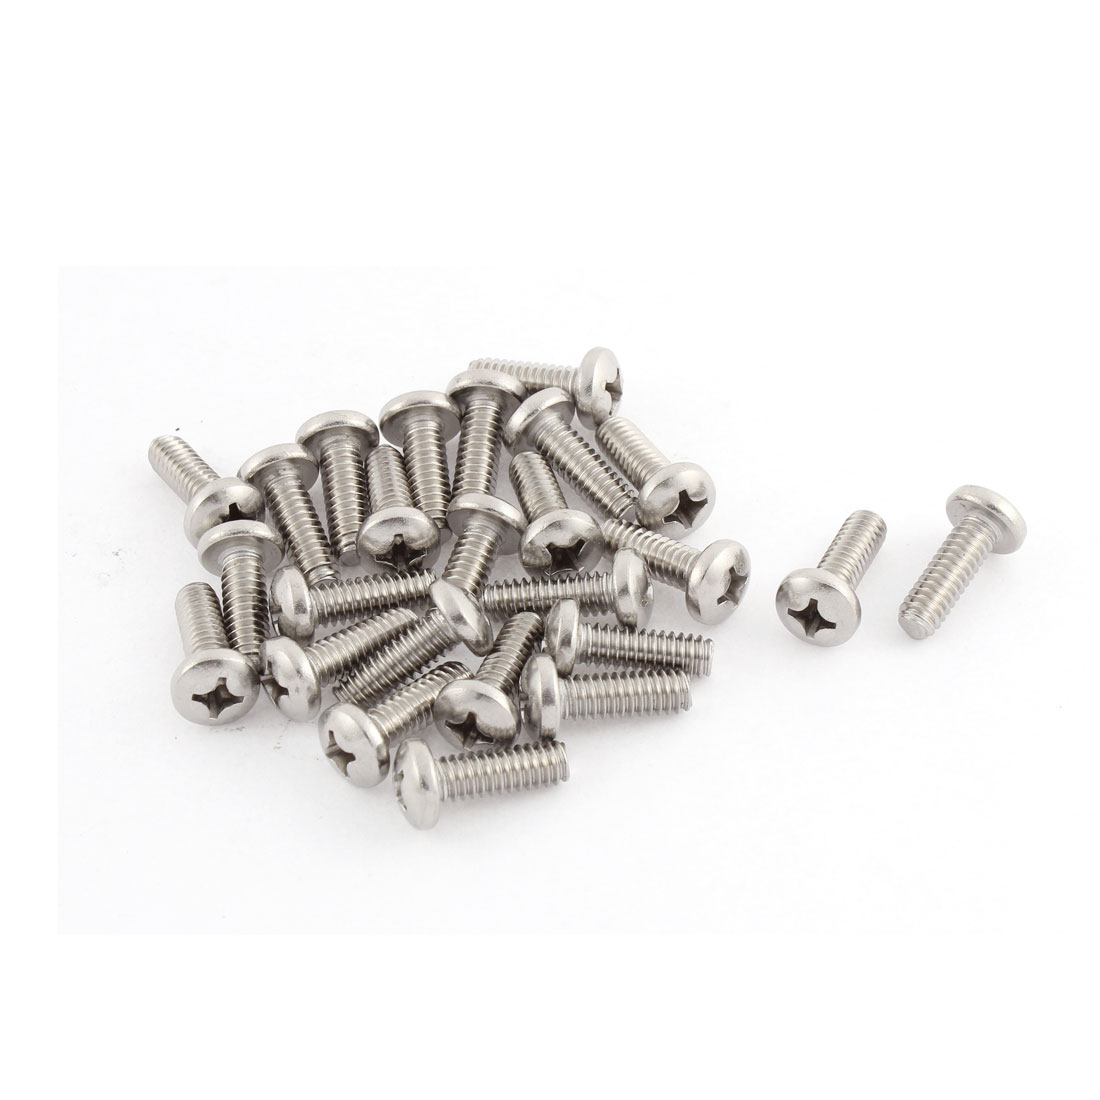 "24mm Long 1/4""x20x3/4"" Stainless Steel Phillips Cross Head Screws 25 Pcs"